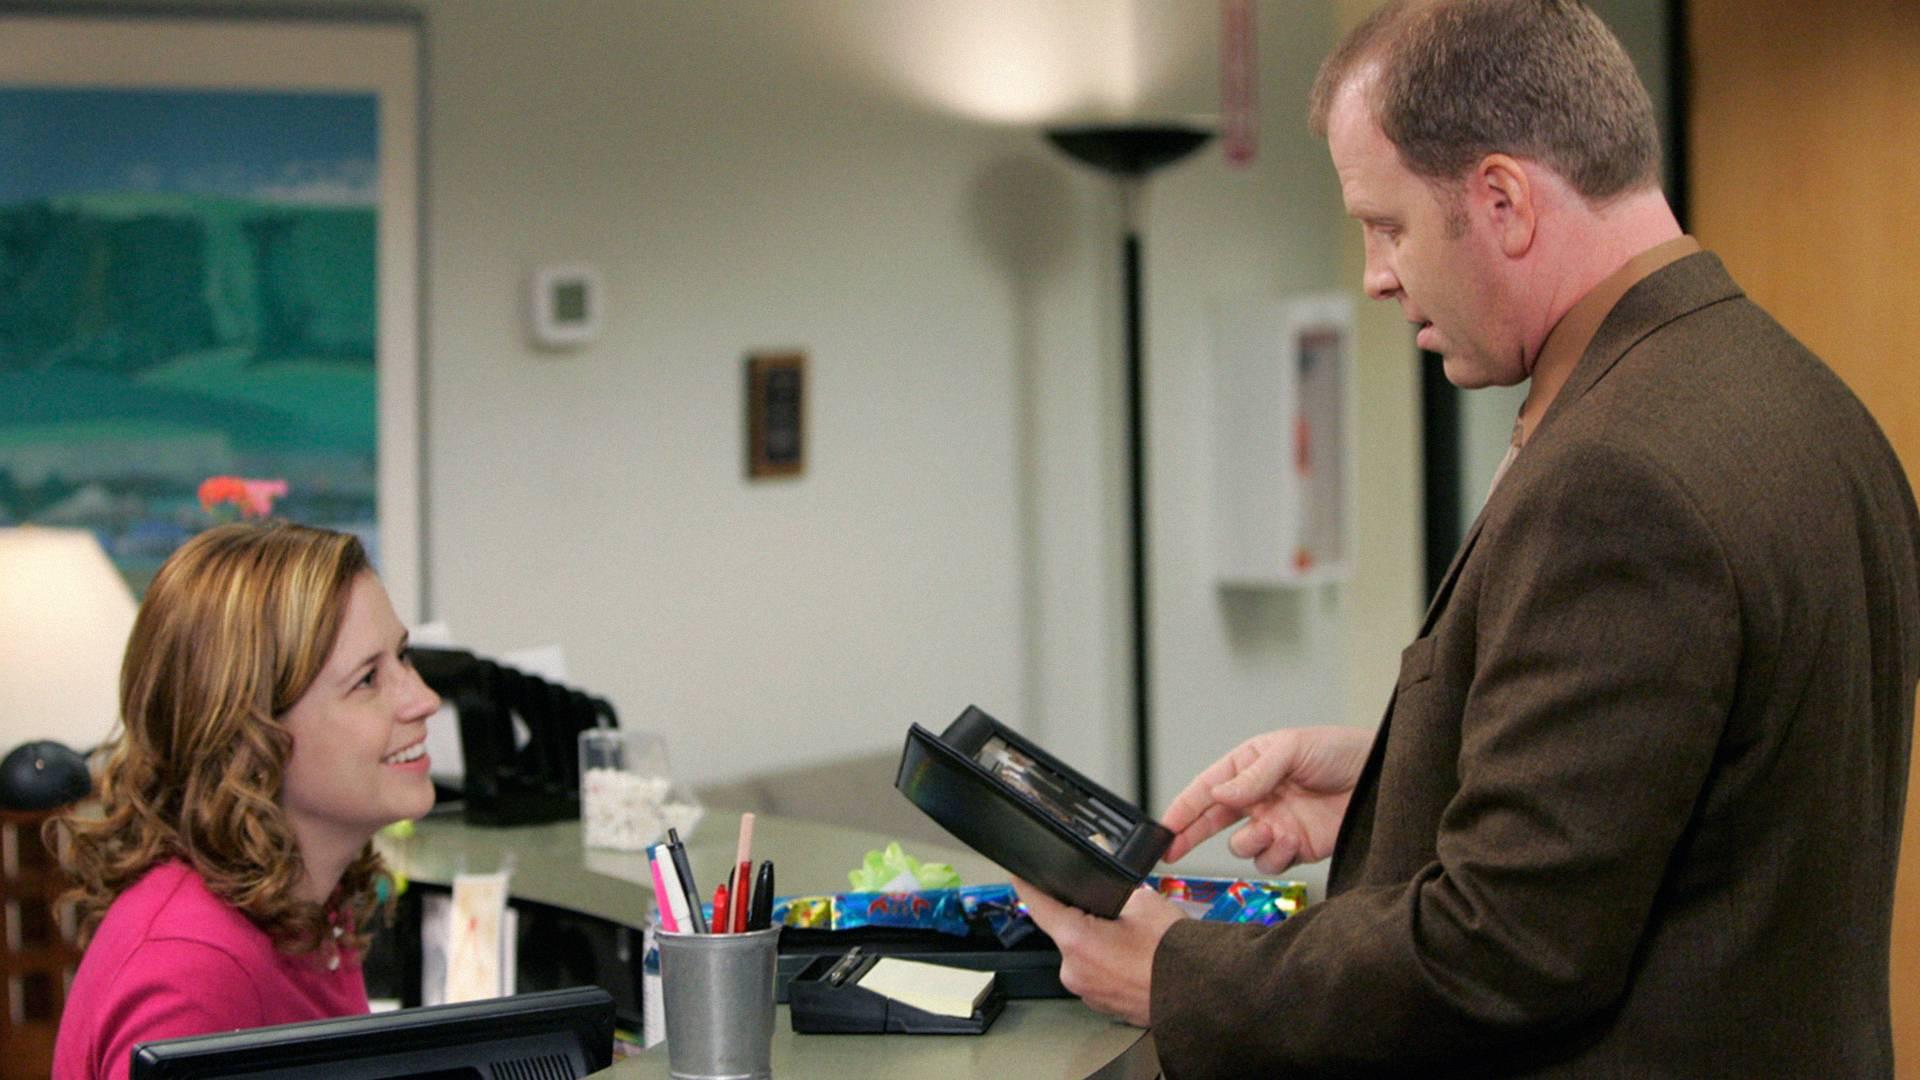 The Office Season 4 Episode 18